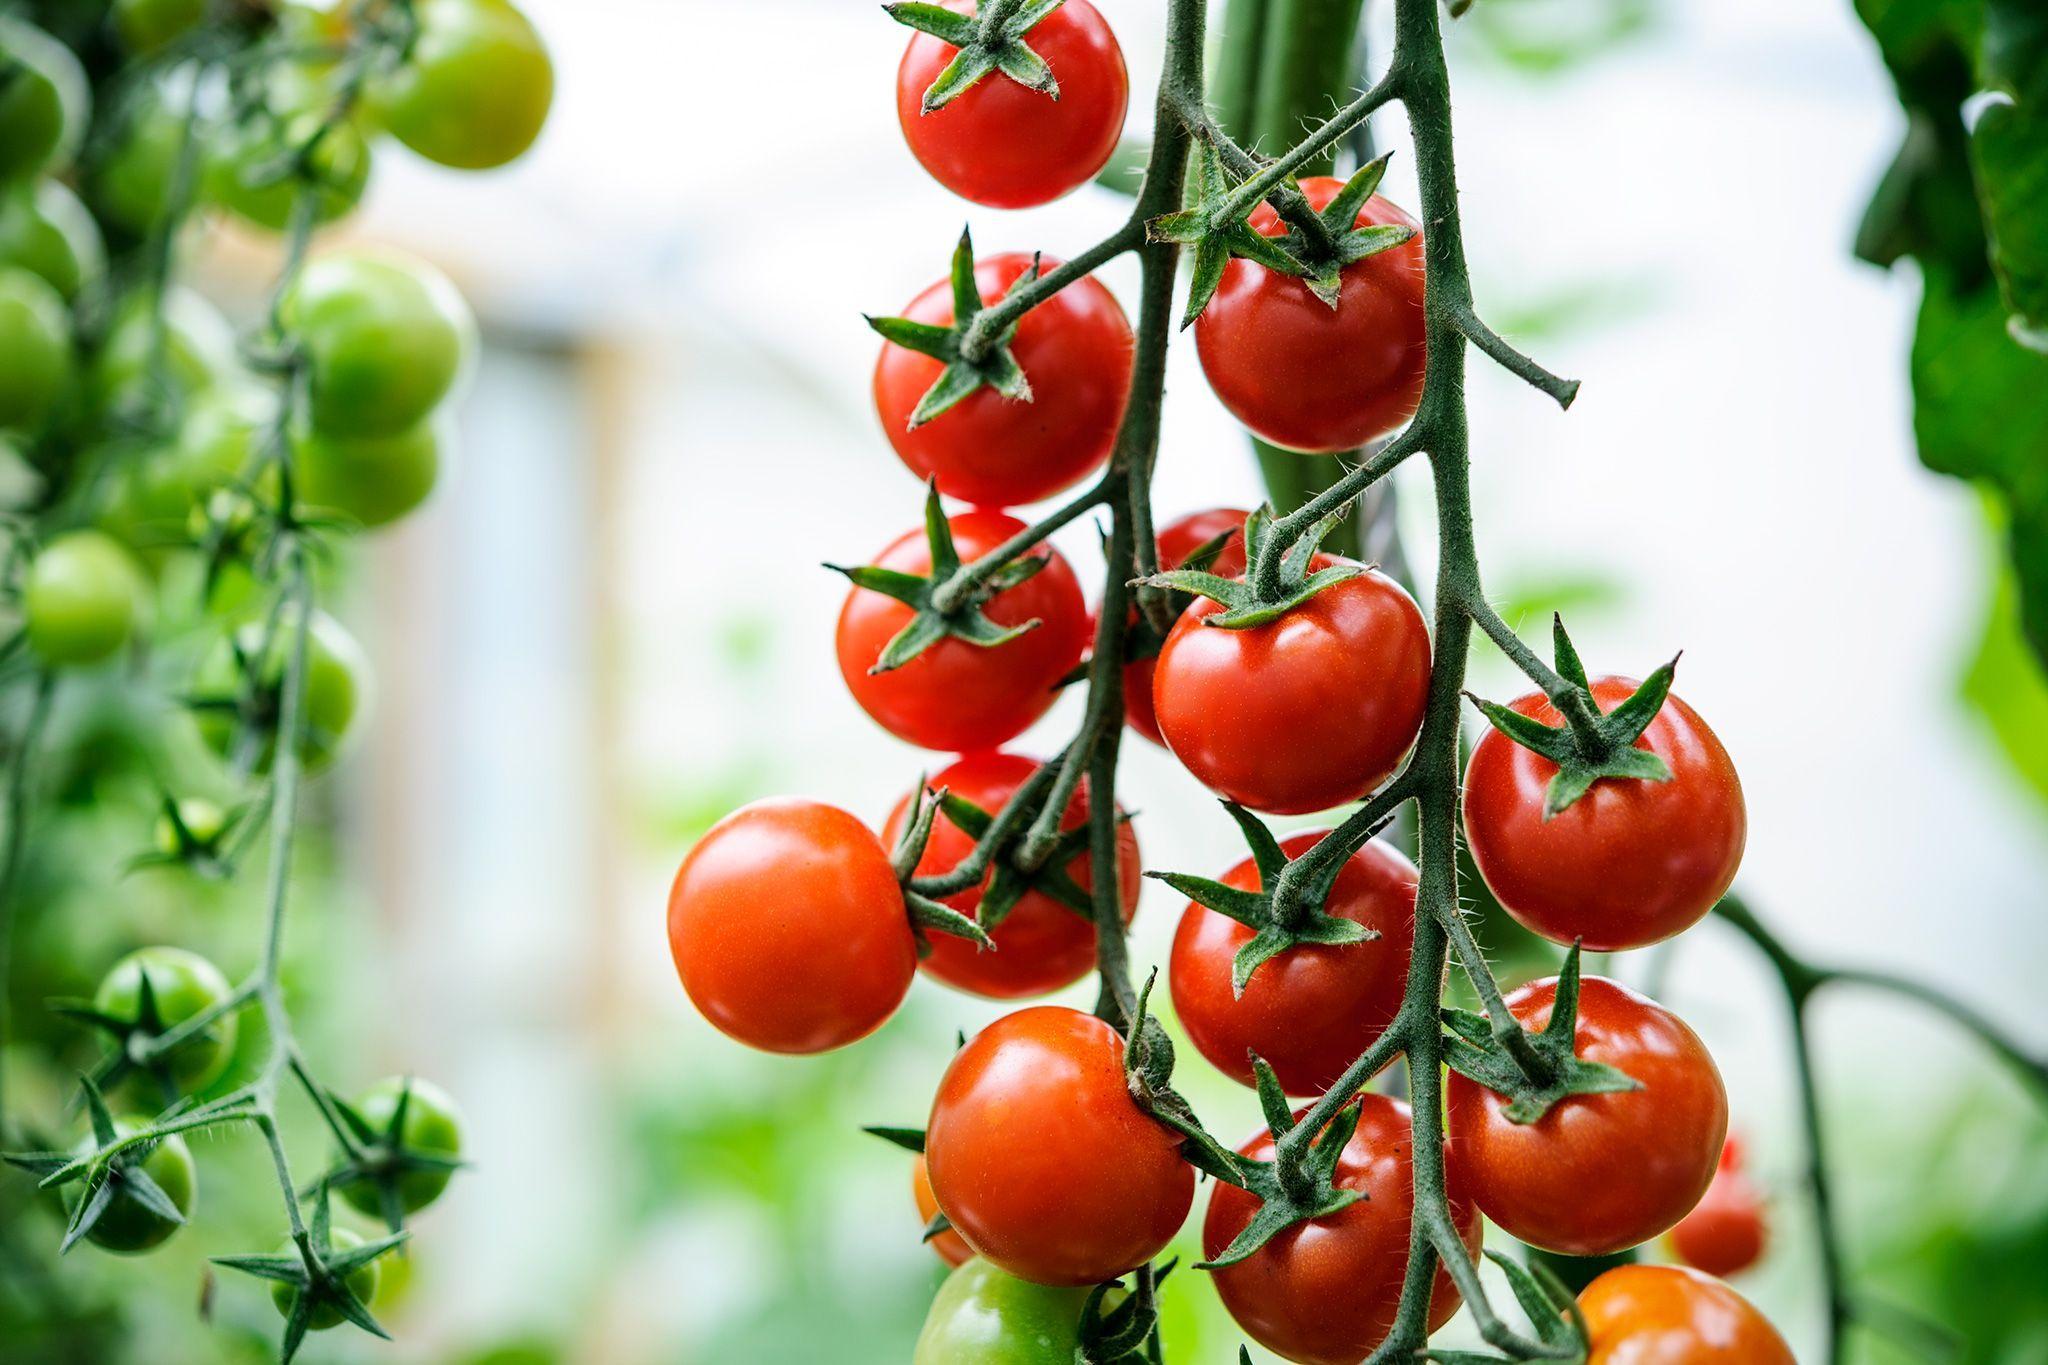 7ca8f4749d24c6b94d4efa24af479ea7 - Gardeners World Magazine Free Tomato Seeds